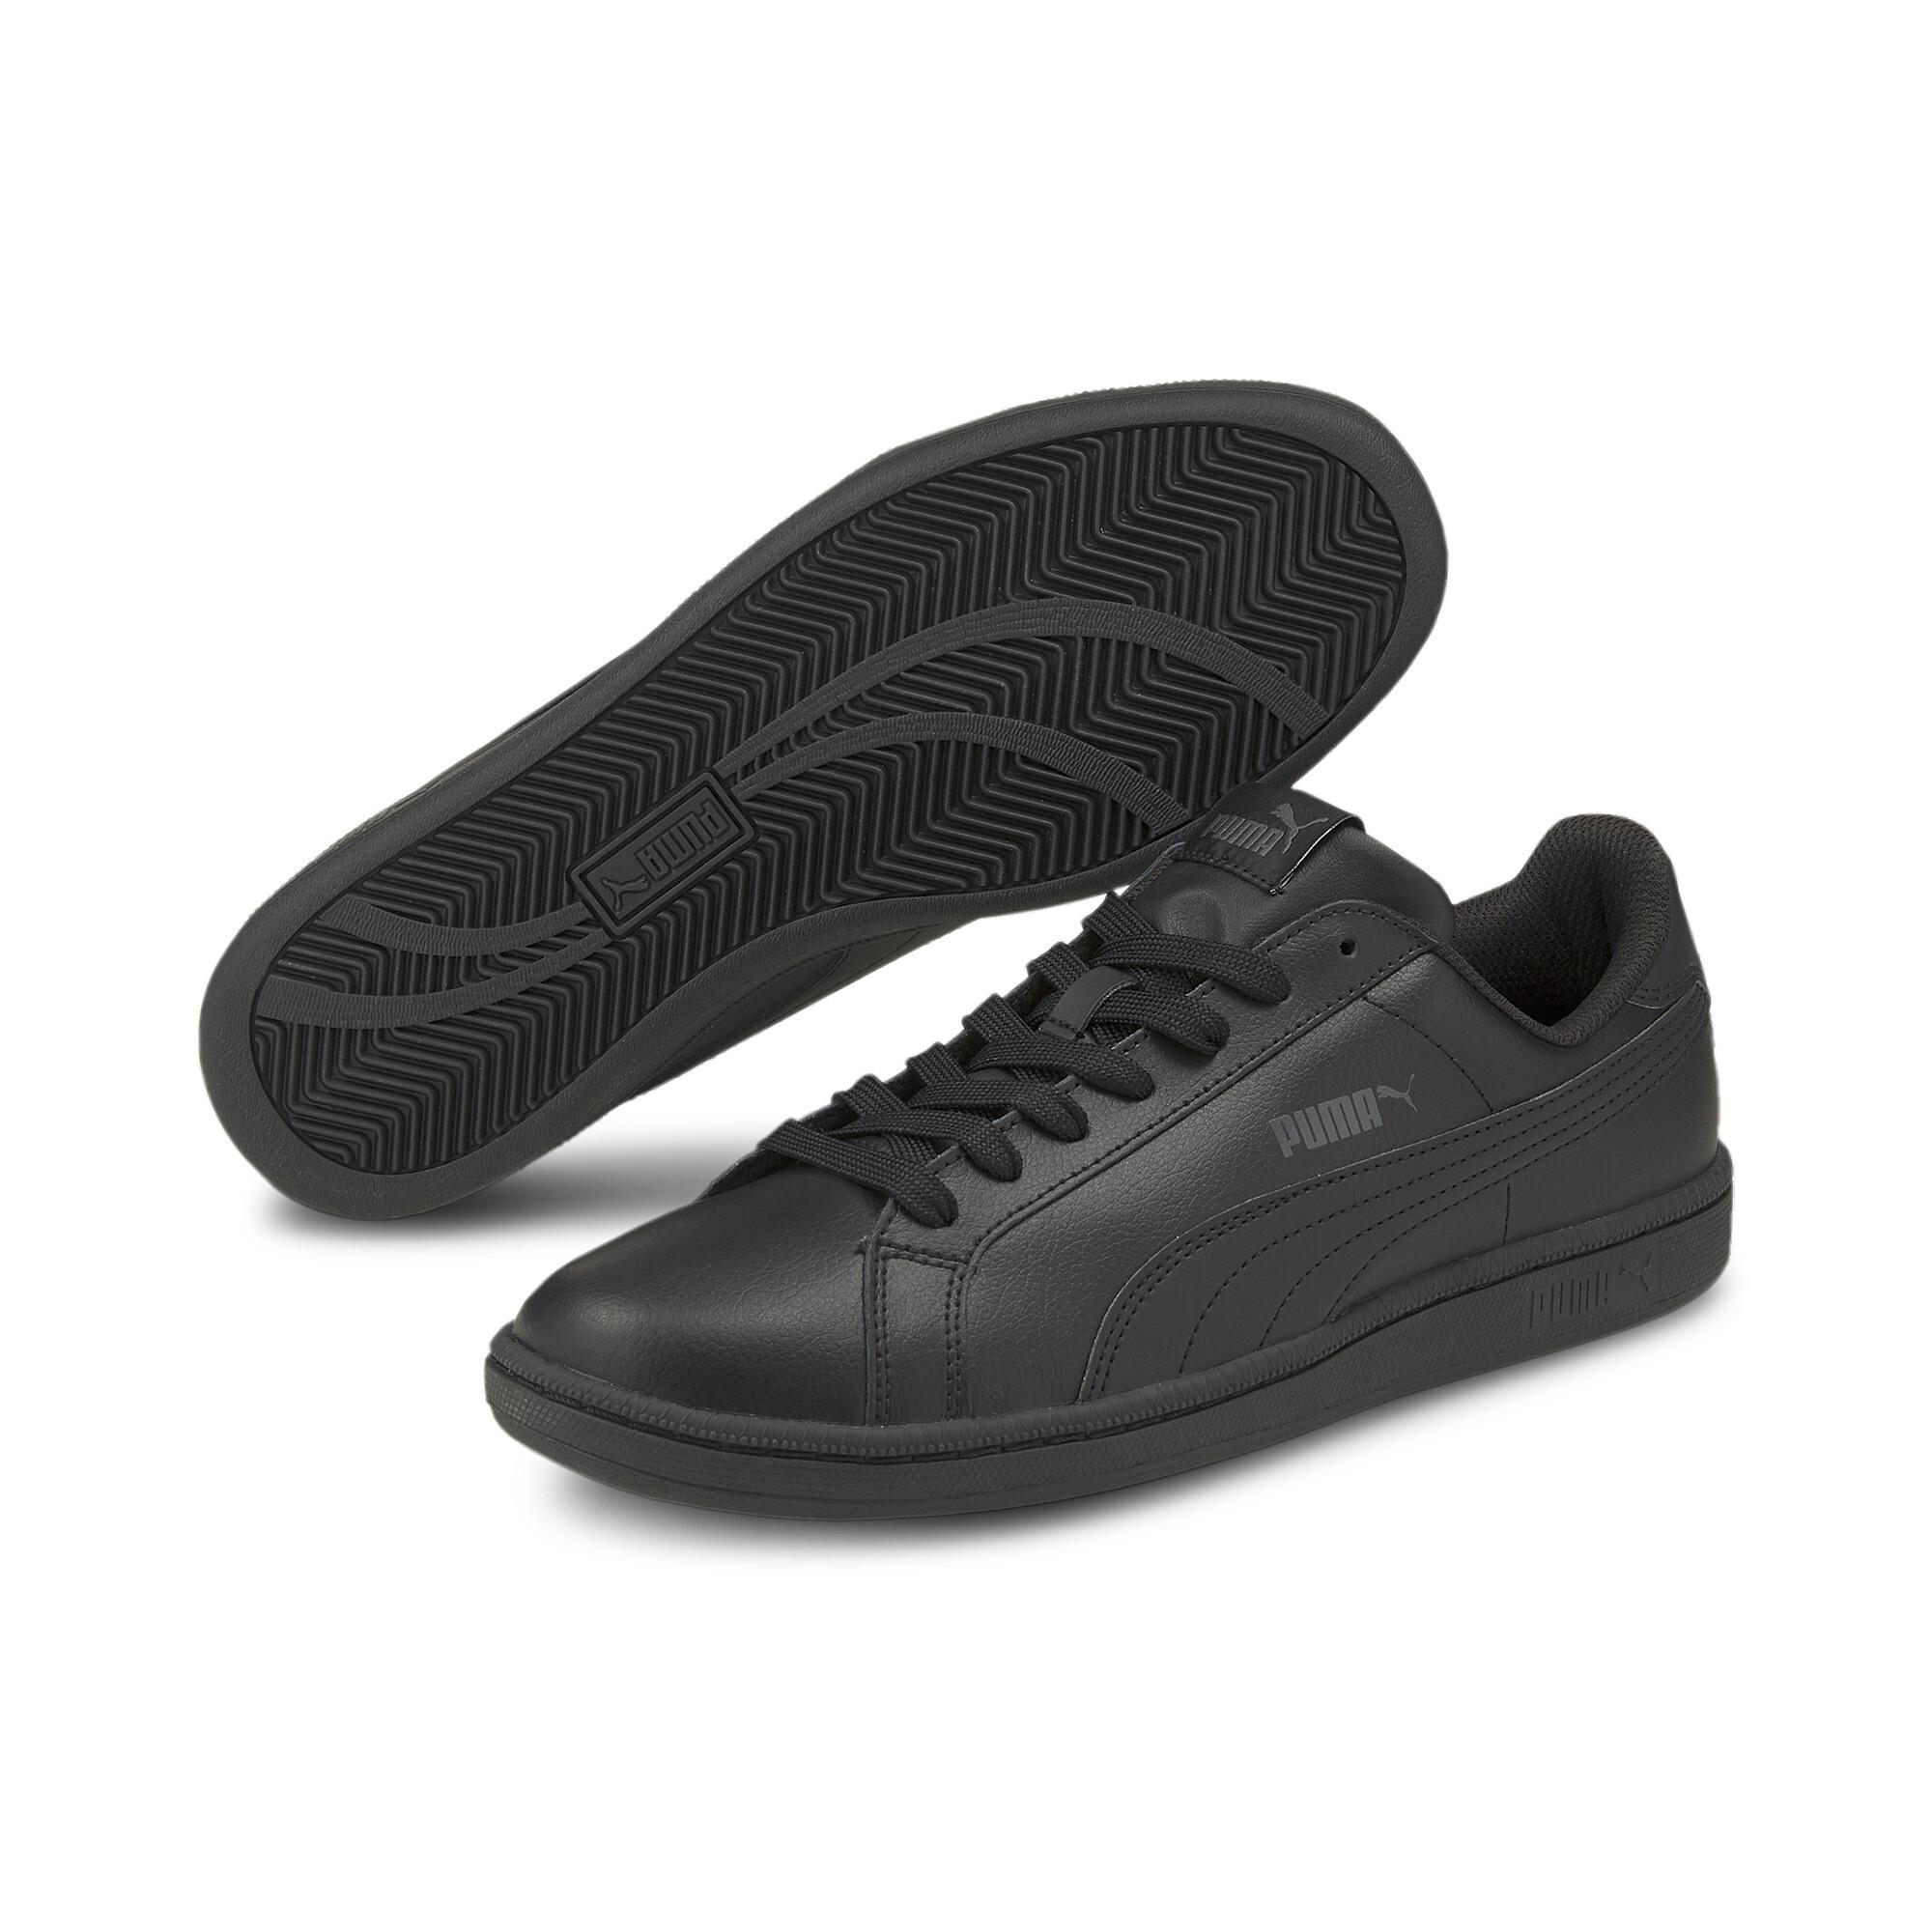 Indexbild 7 - PUMA Smash Trainers Schuhe Sneakers Sport Classics Unisex Neu